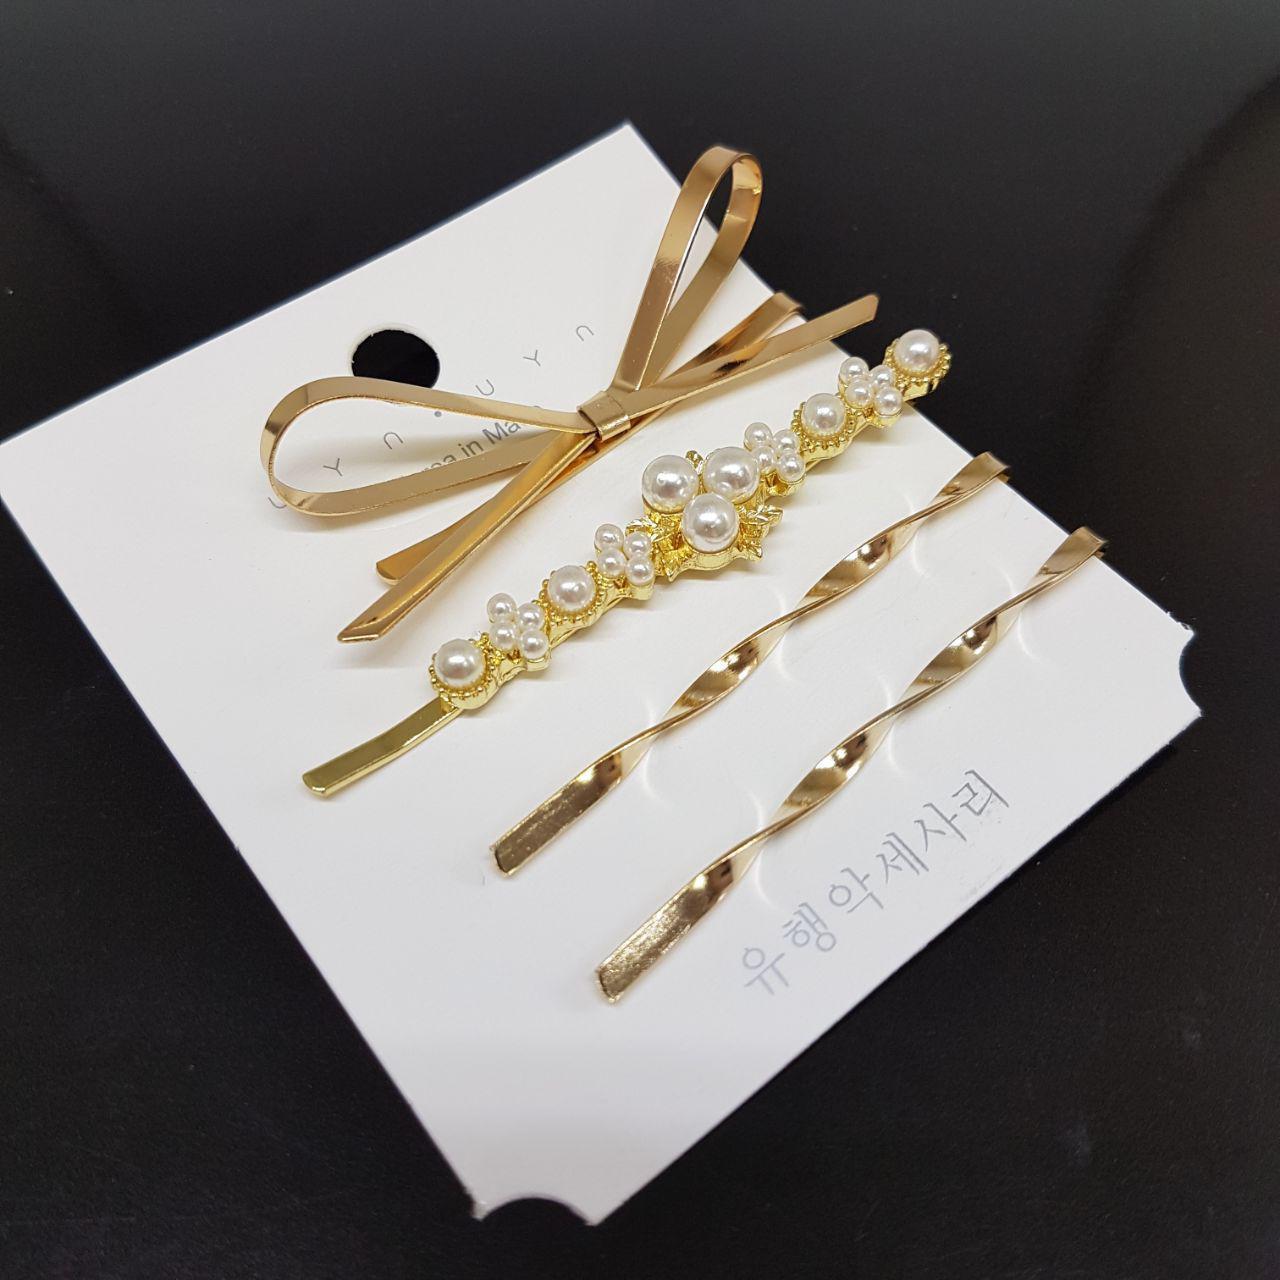 Набор из 4 украшений-заколок для волос UYN UYN (арт.05-bantik-4pcs)